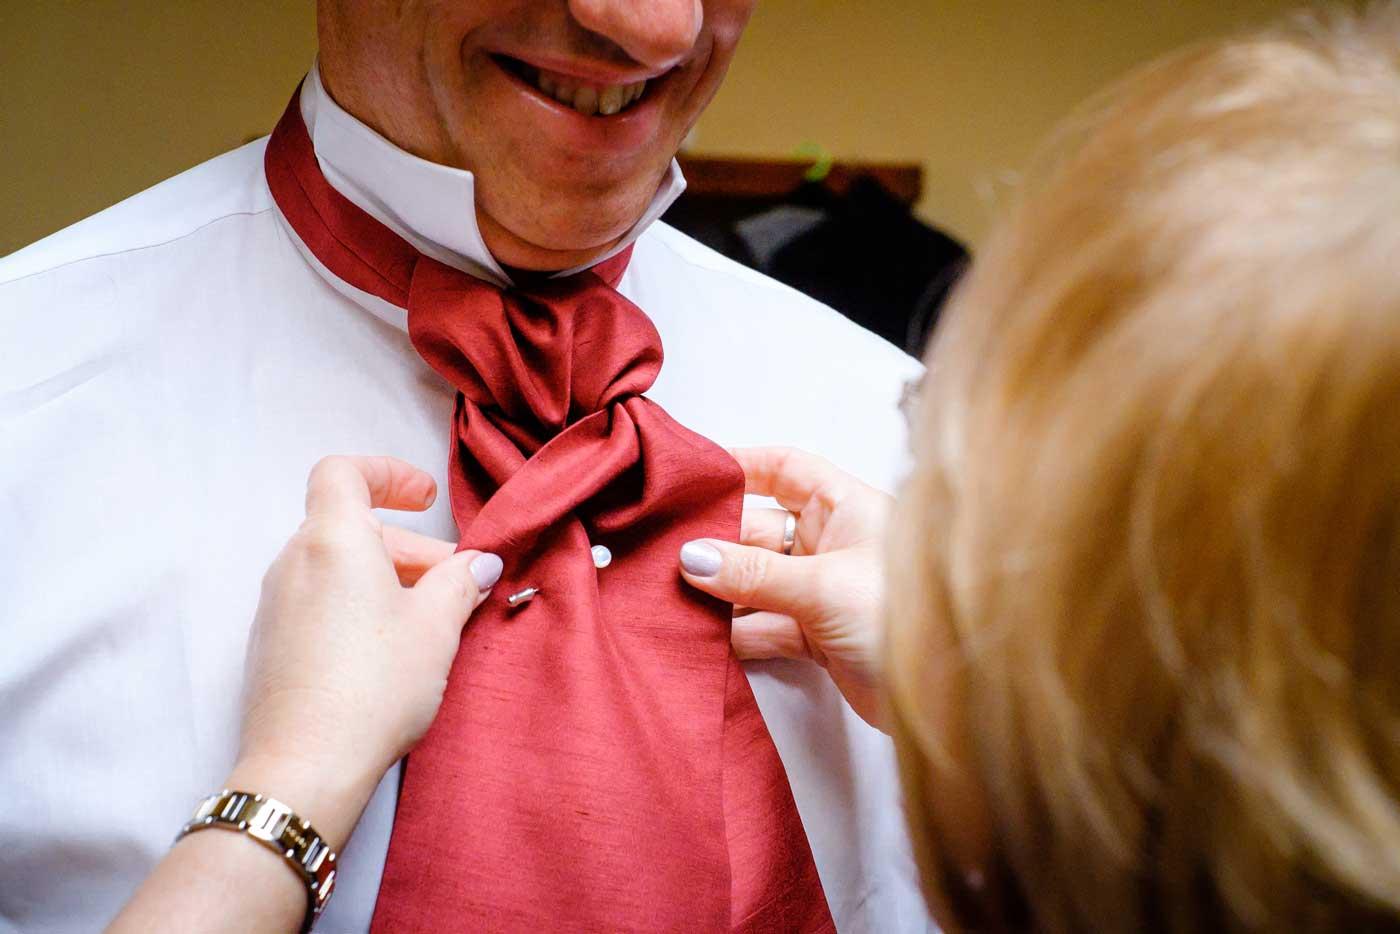 Close-up of groom's cravat